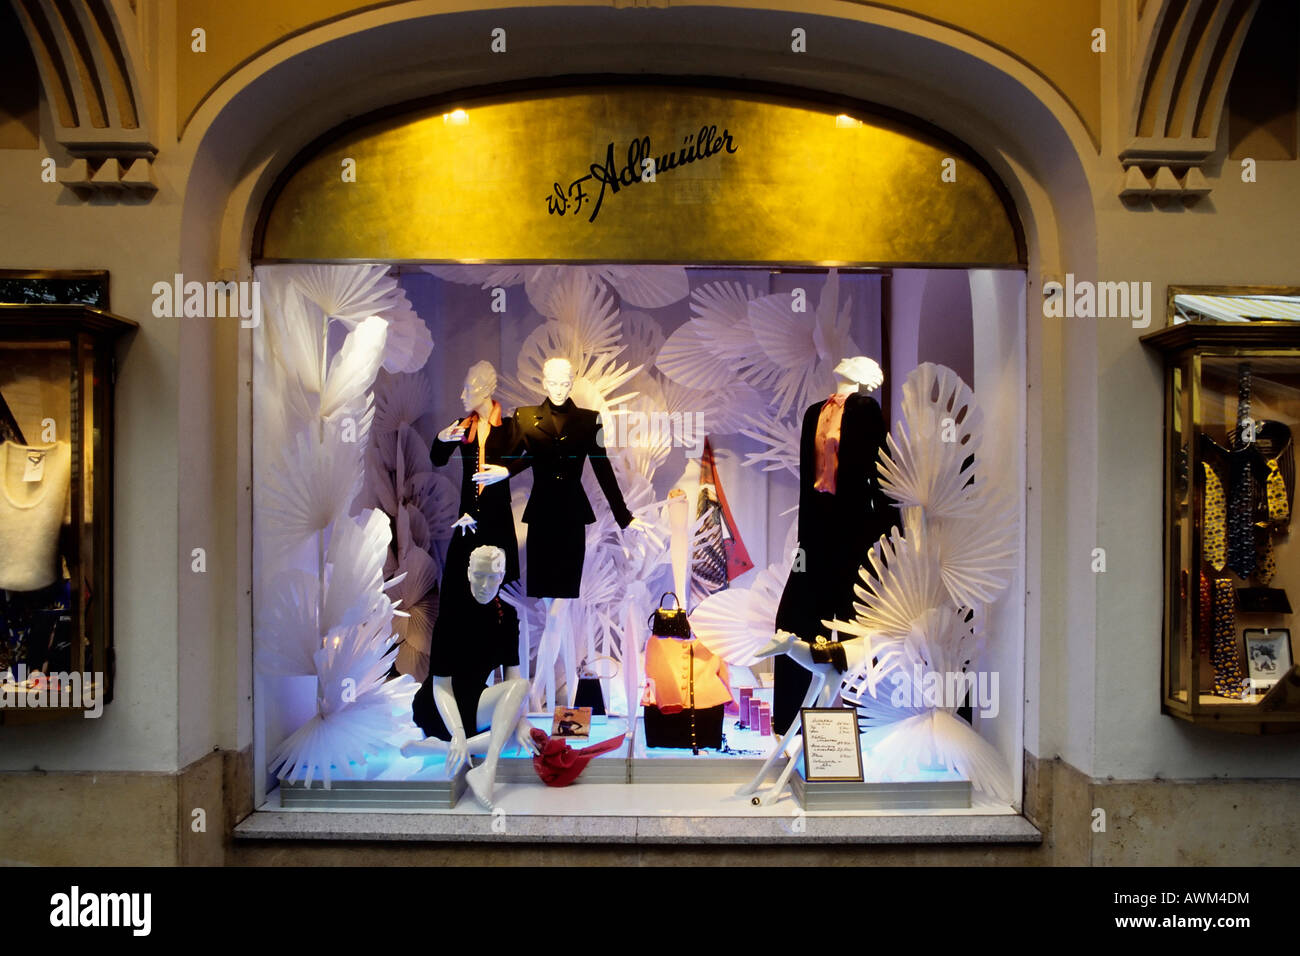 Shop window, Adlmueller couture boutique, Kaertnerstrasse St., Vienna, Austria, Europe - Stock Image